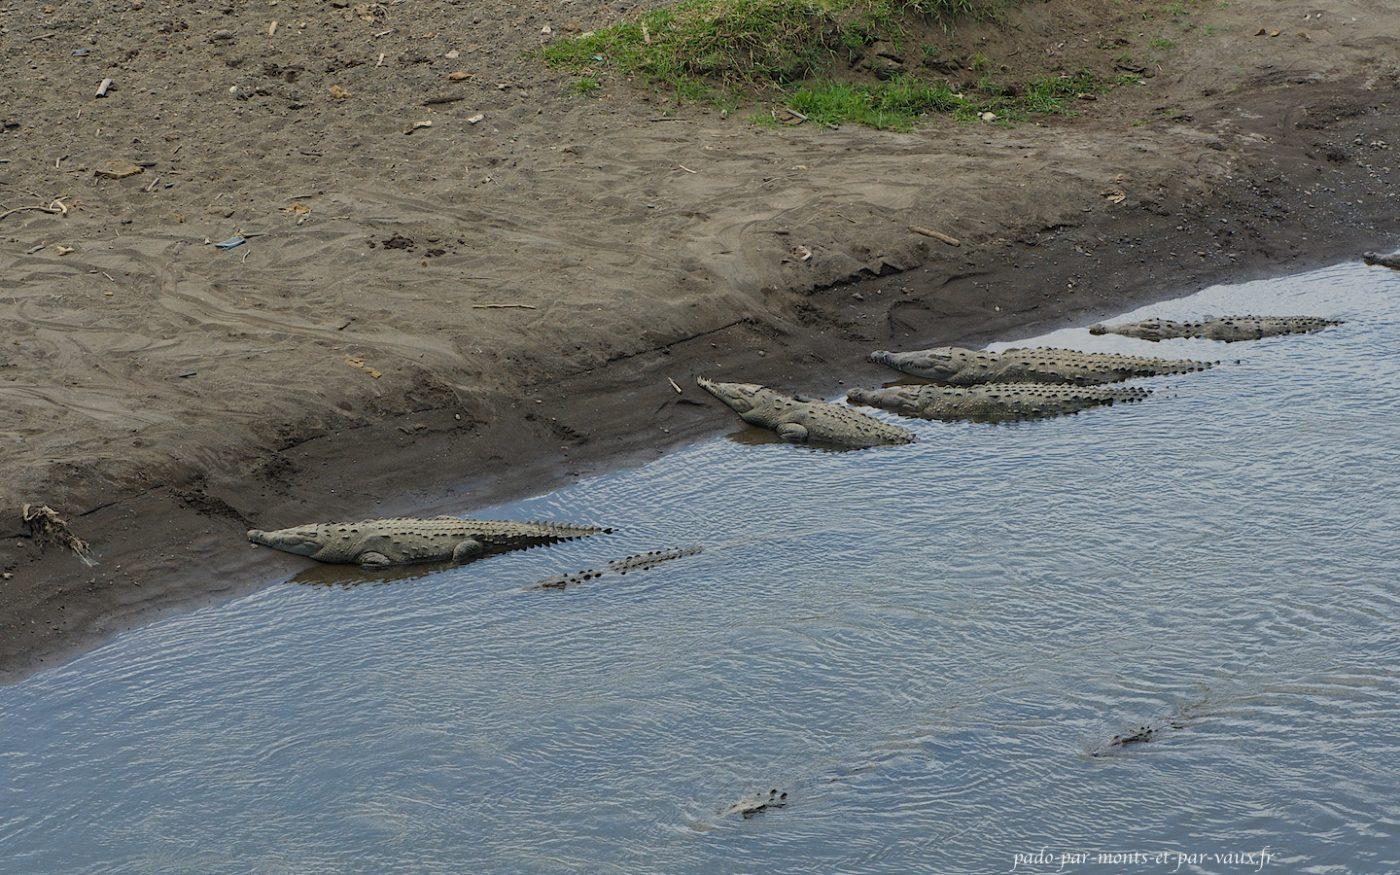 Rio Tarcolès - crocodiles